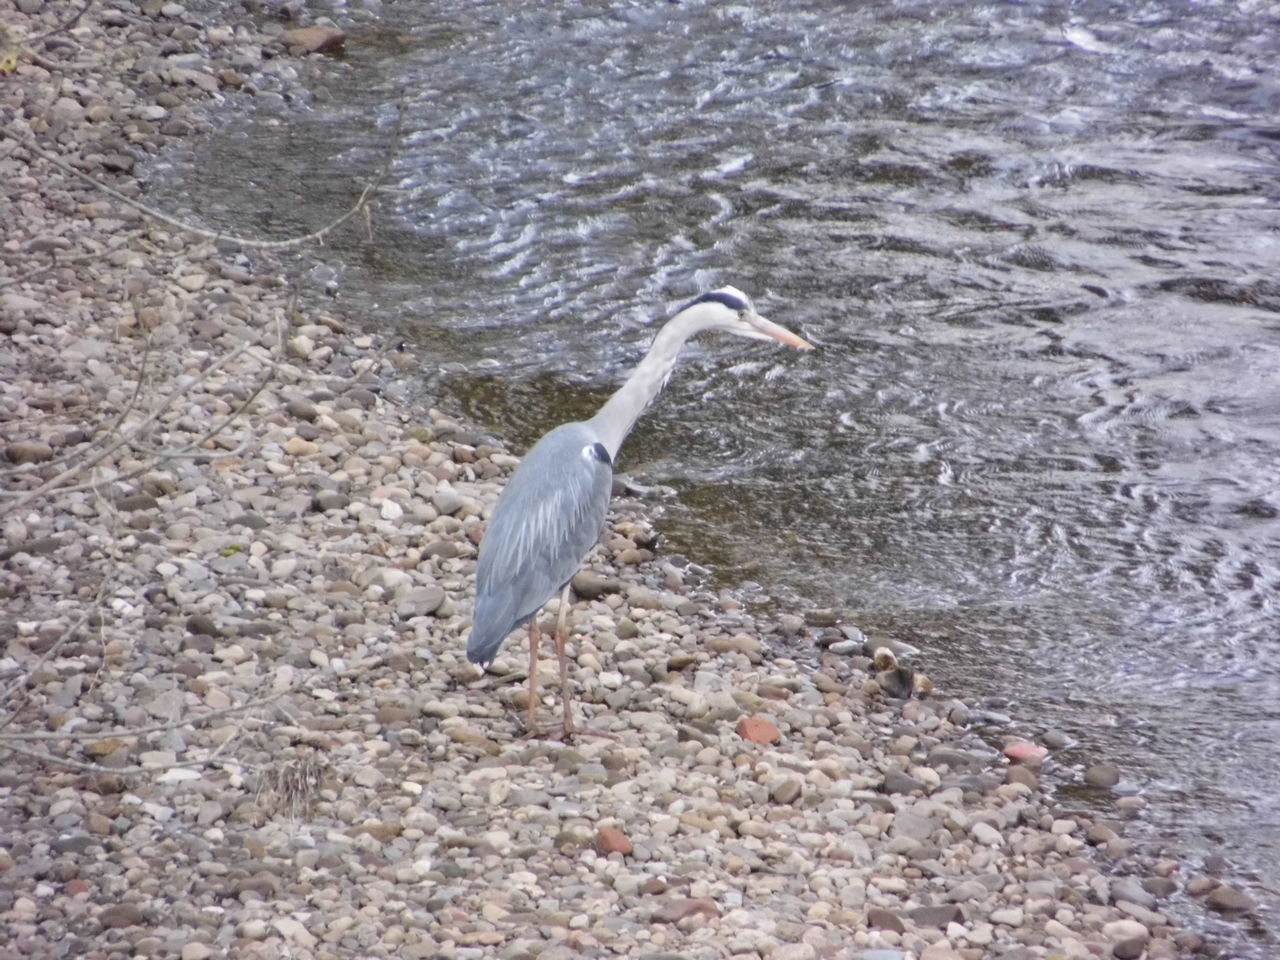 one animal, animal themes, bird, water, heron, day, animals in the wild, nature, outdoors, no people, gray heron, animal wildlife